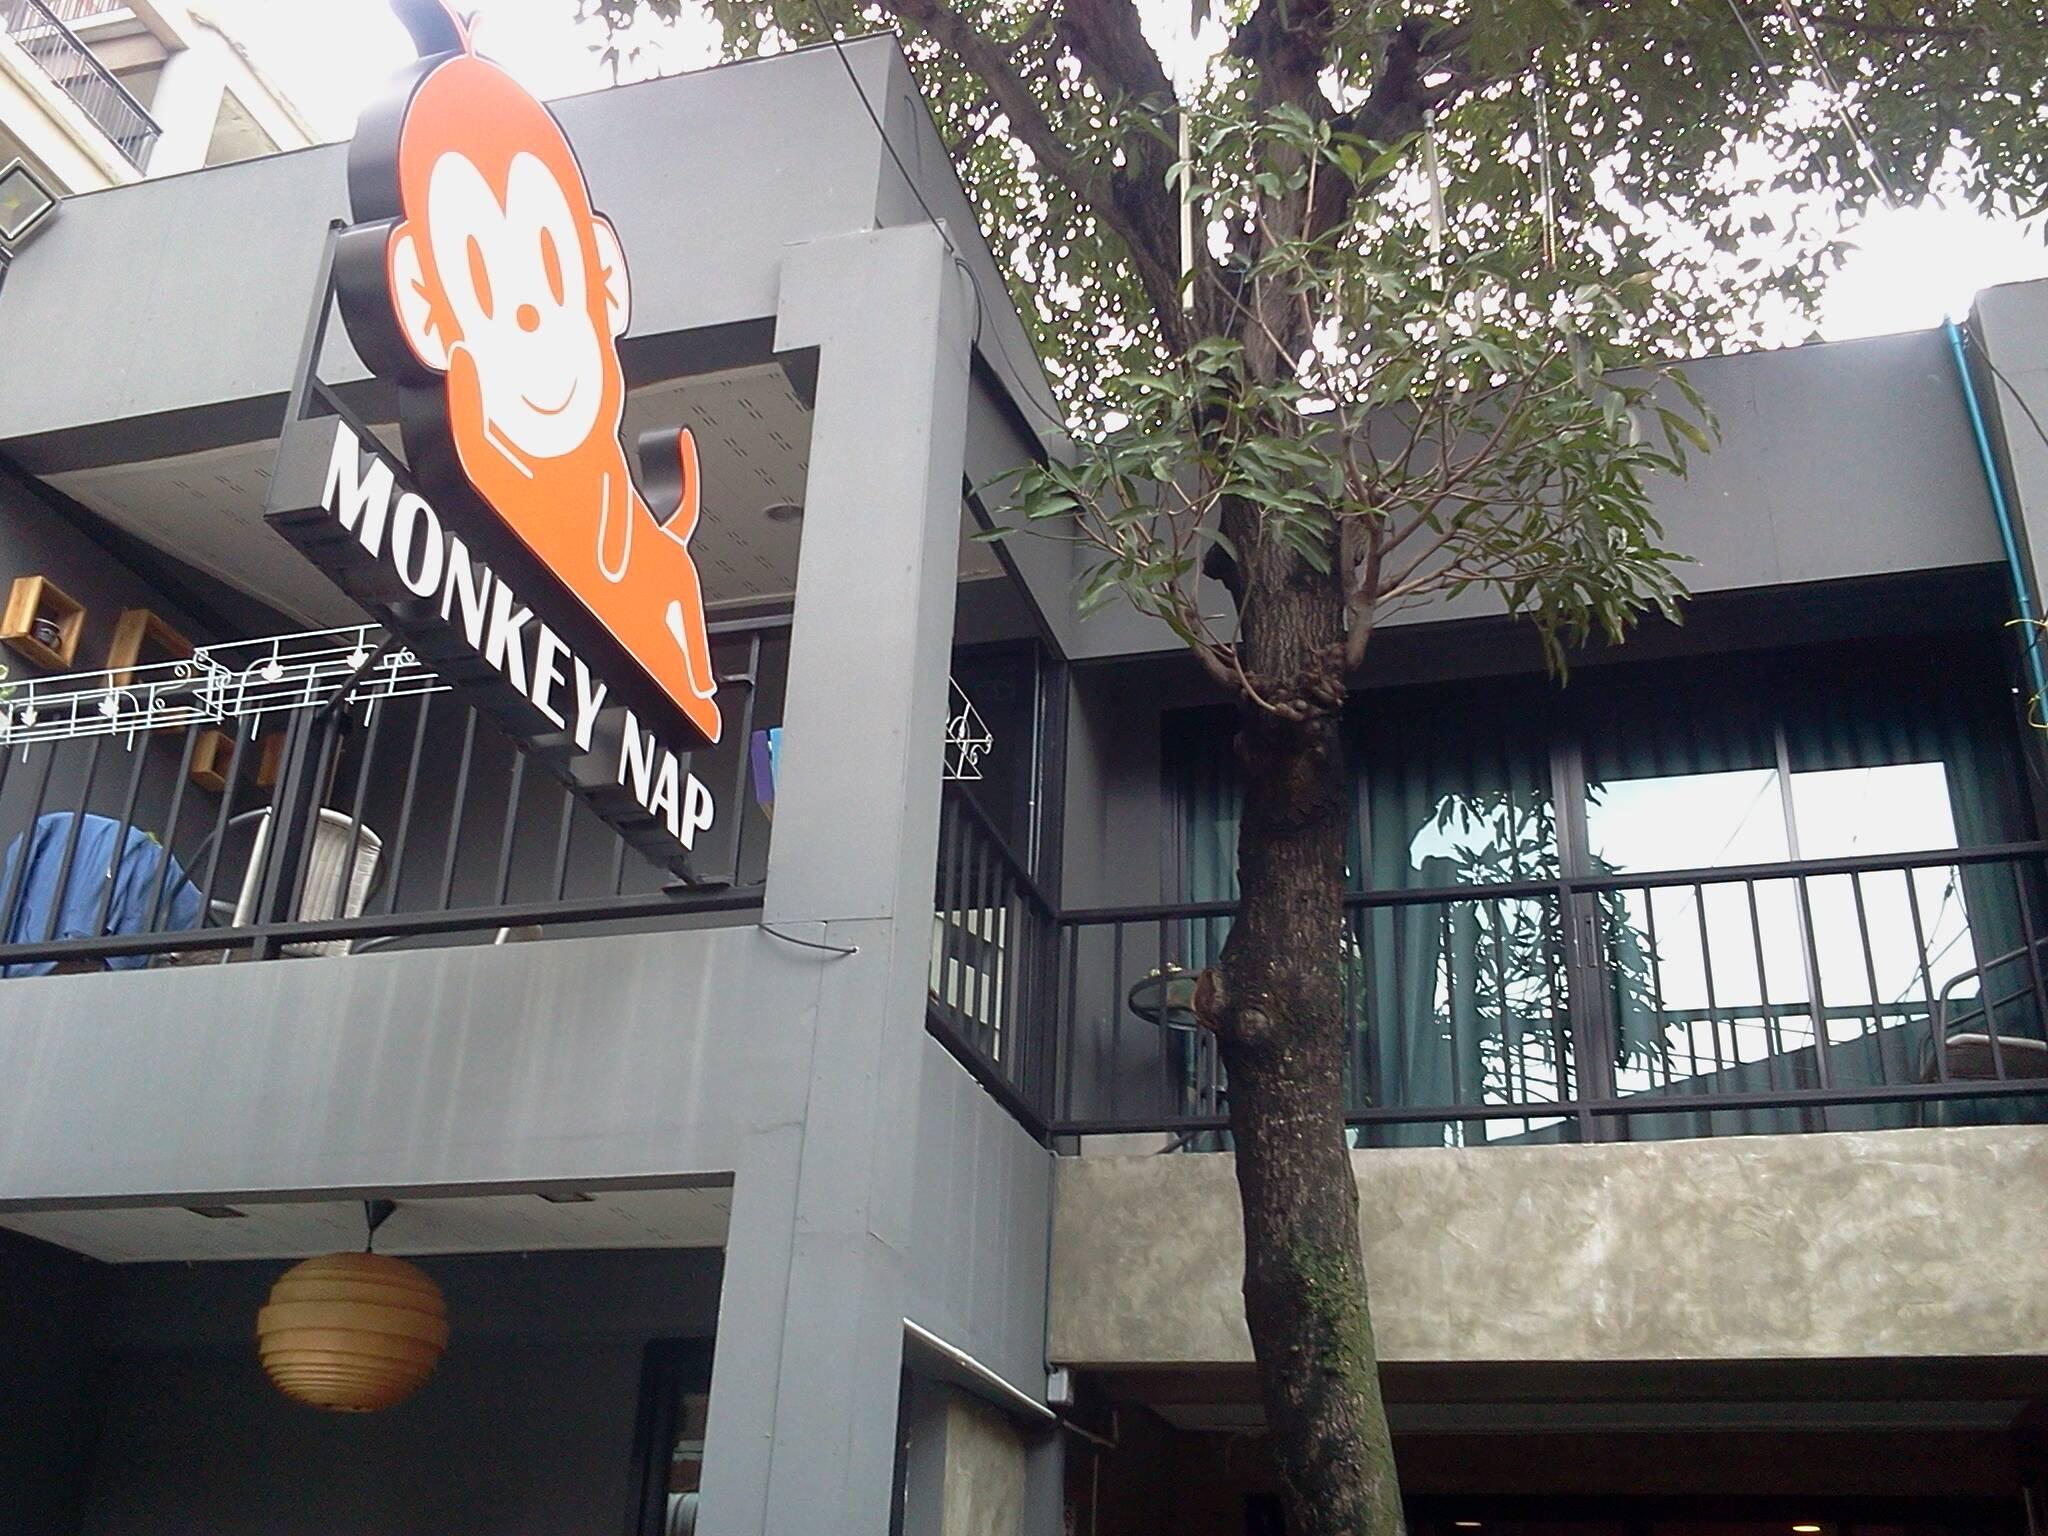 monkey-nap-hostel-em-bangkok